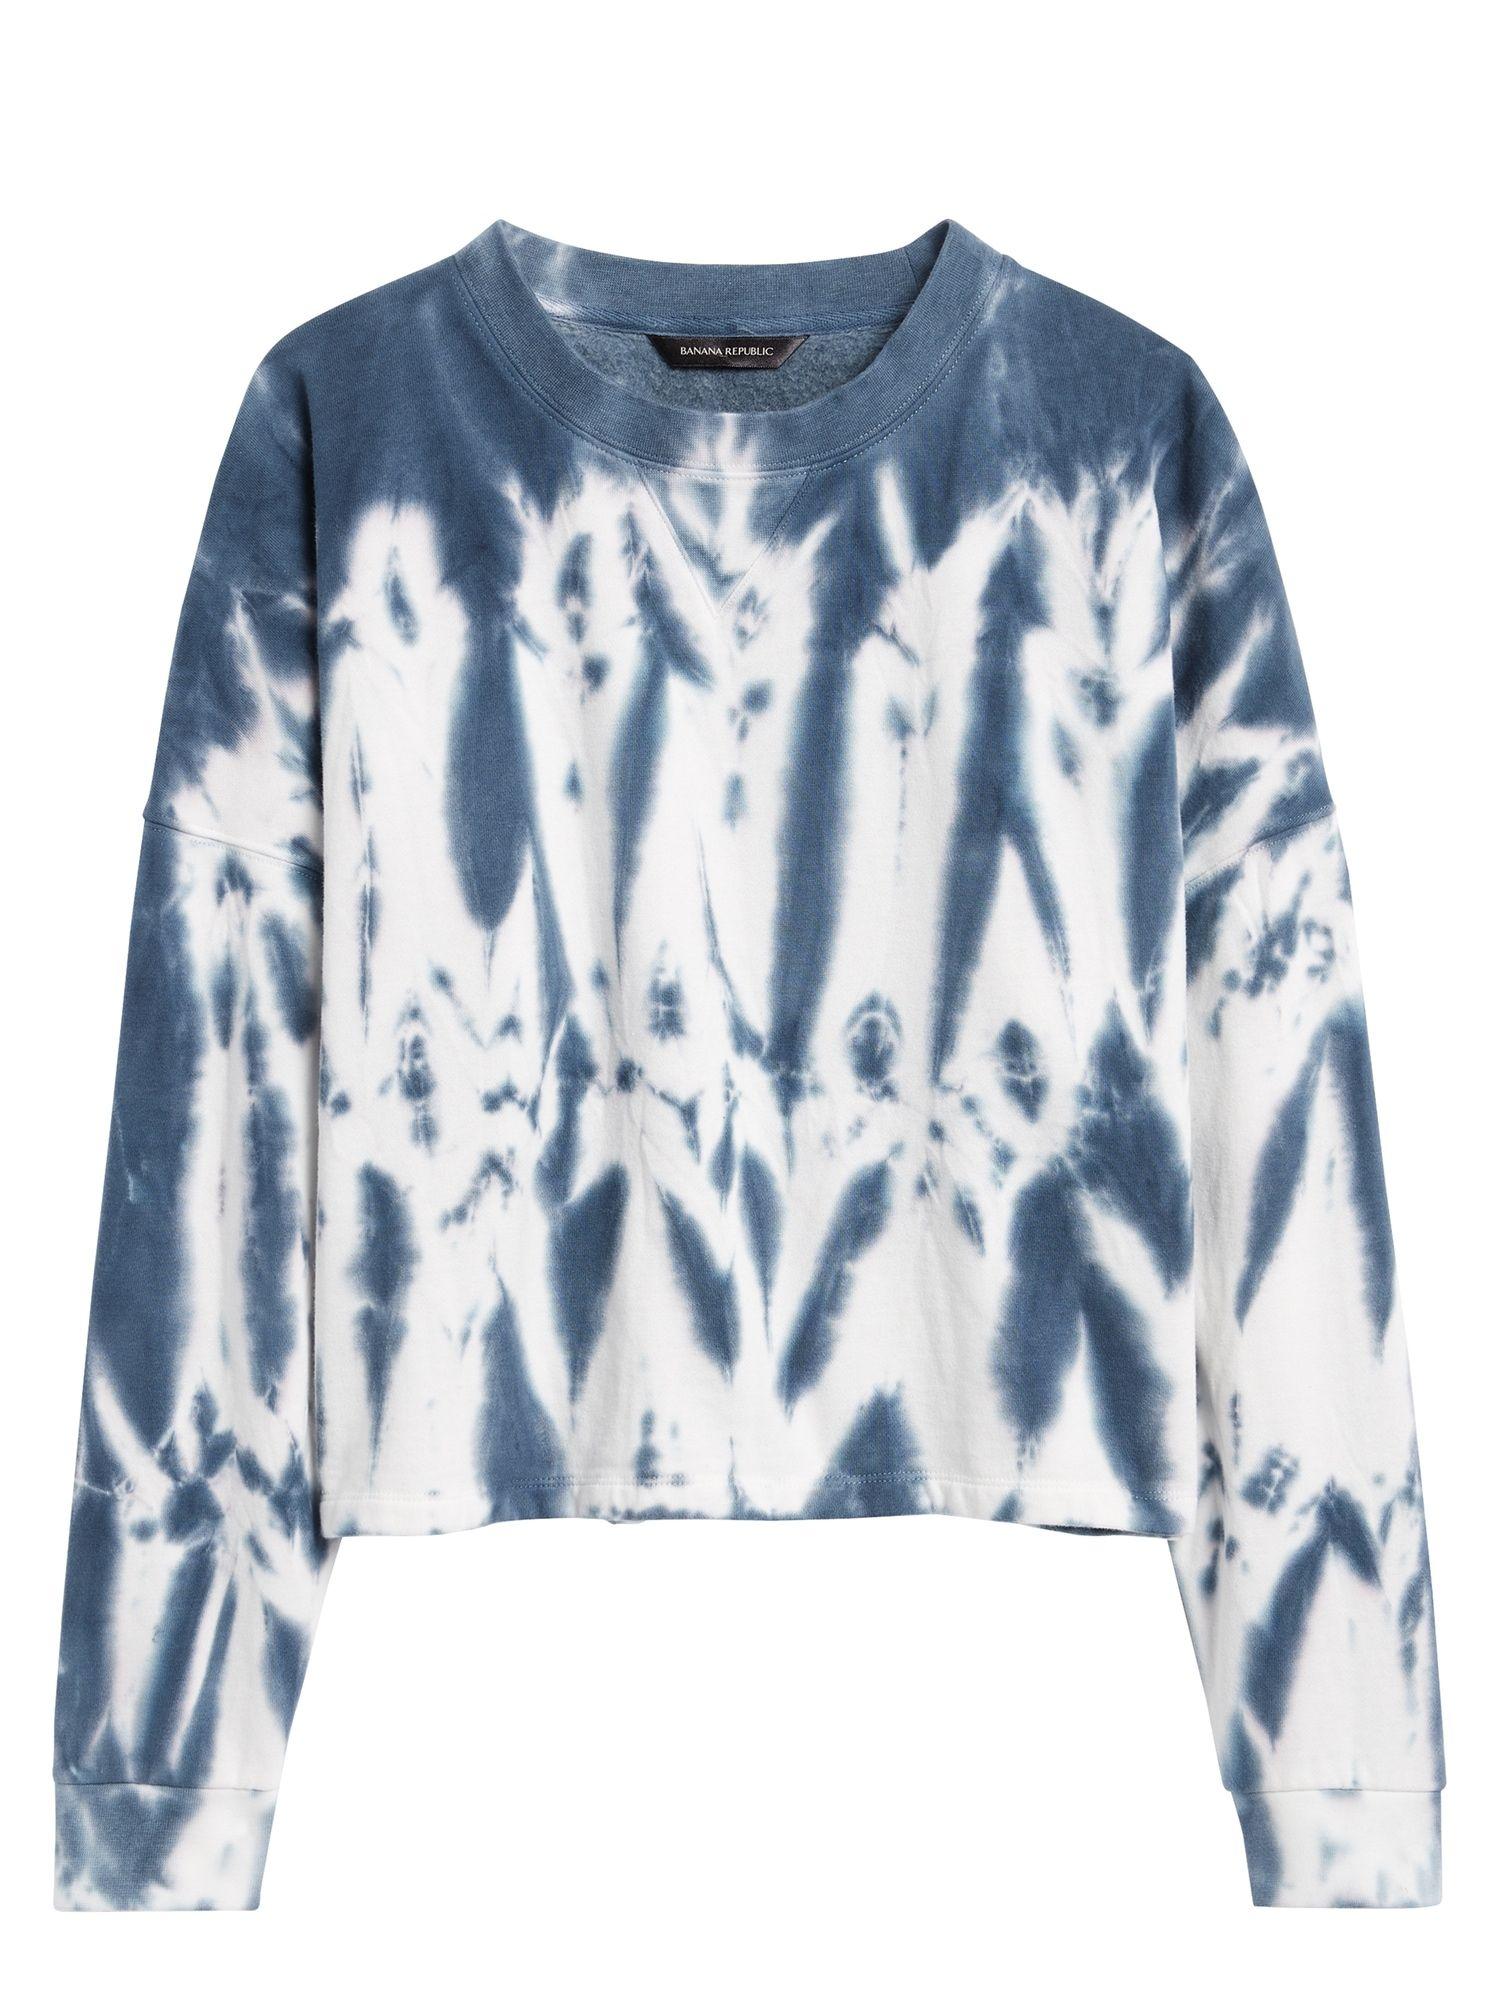 Cropped Tie Dye Sweatshirt Banana Republic Tie Dye Sweatshirt Sweatshirts Tie Dye Fashion [ 2000 x 1500 Pixel ]